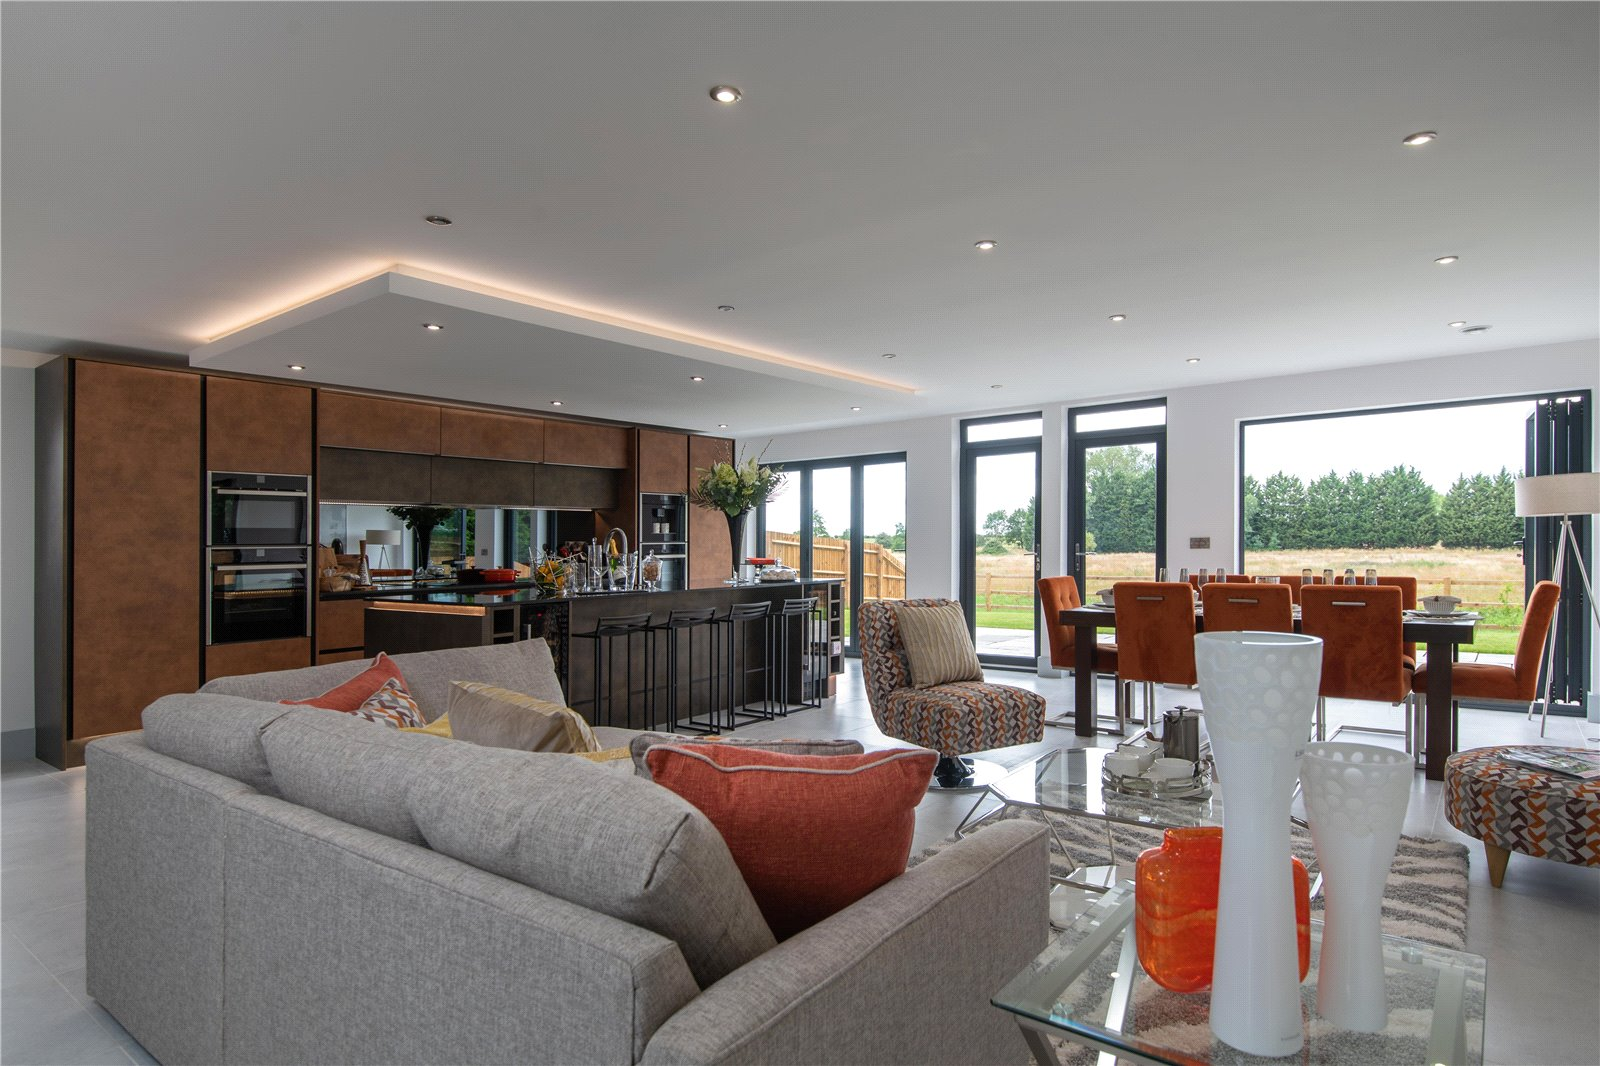 4 bed house for sale in Eynesbury Hardwicke, PE19 6XG, PE19